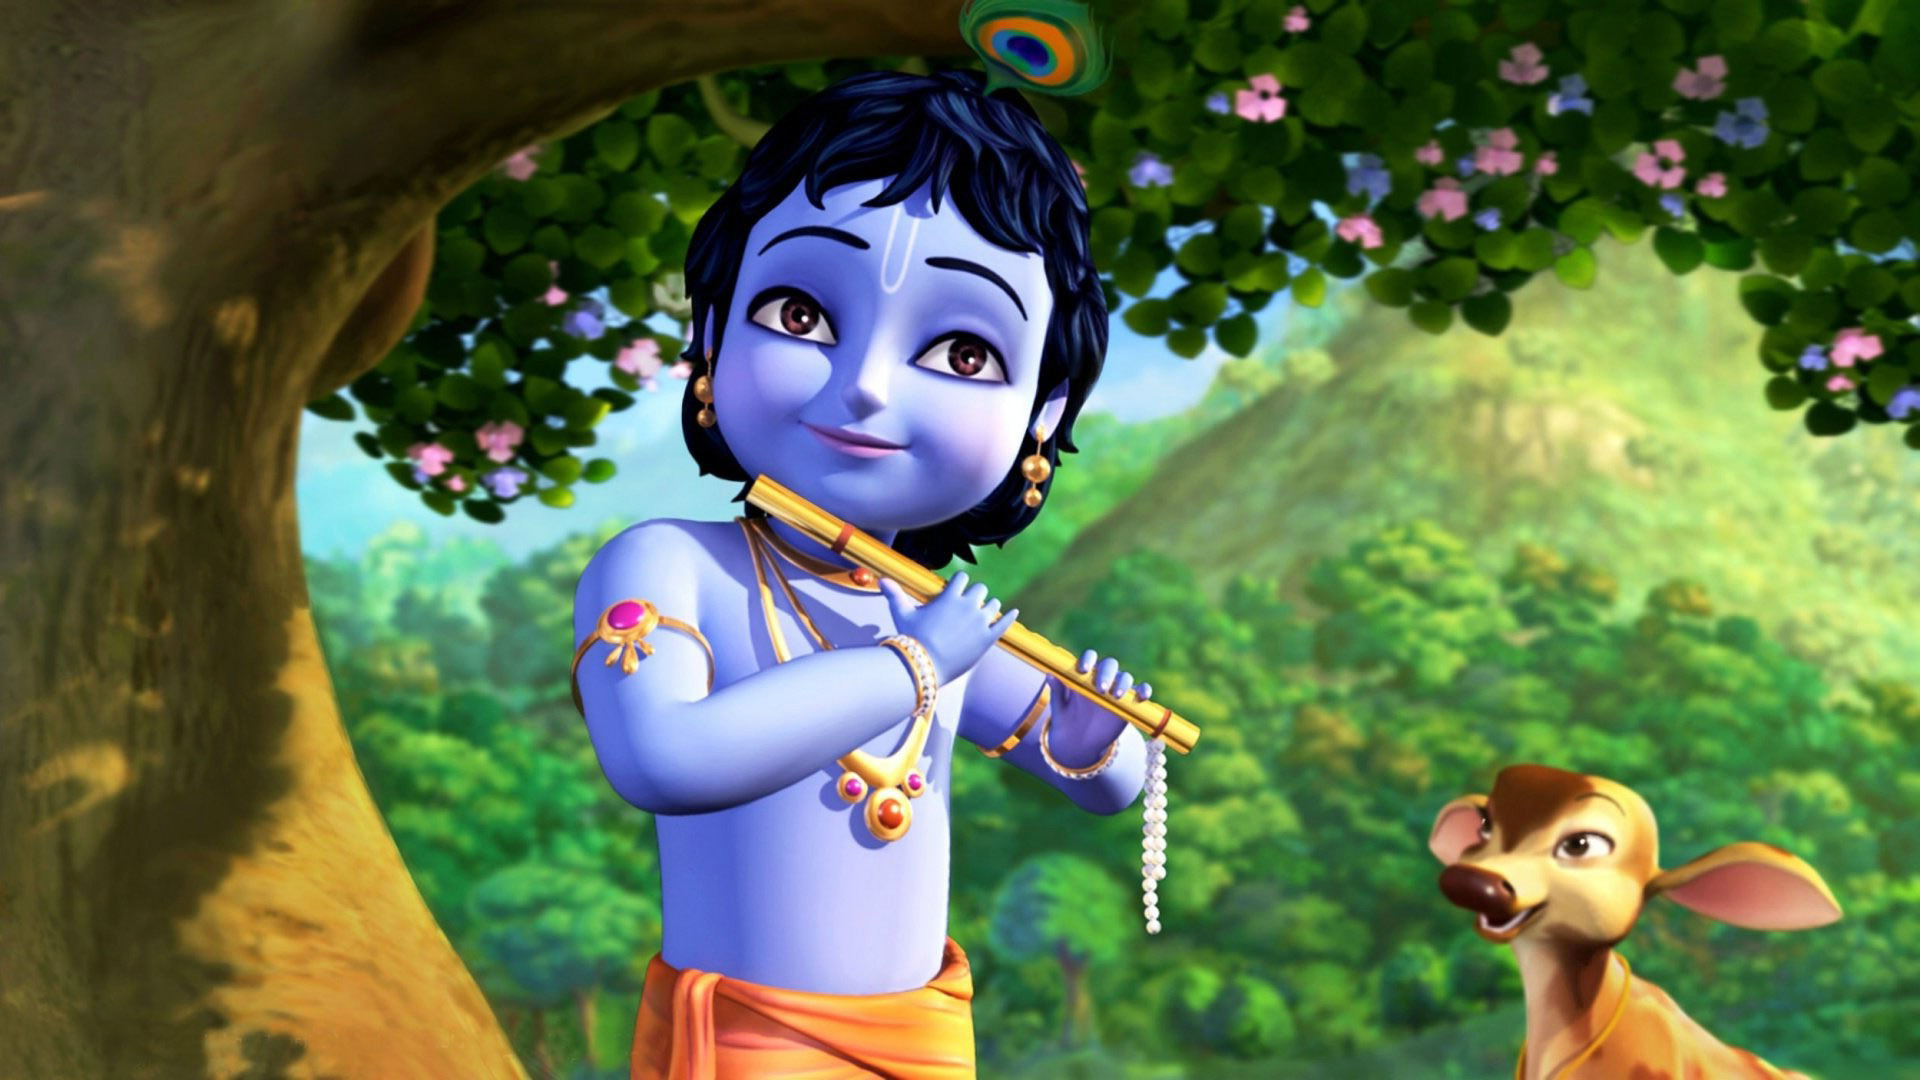 Little Krishna - Cute Happy Krishna Janmashtami - HD Wallpaper